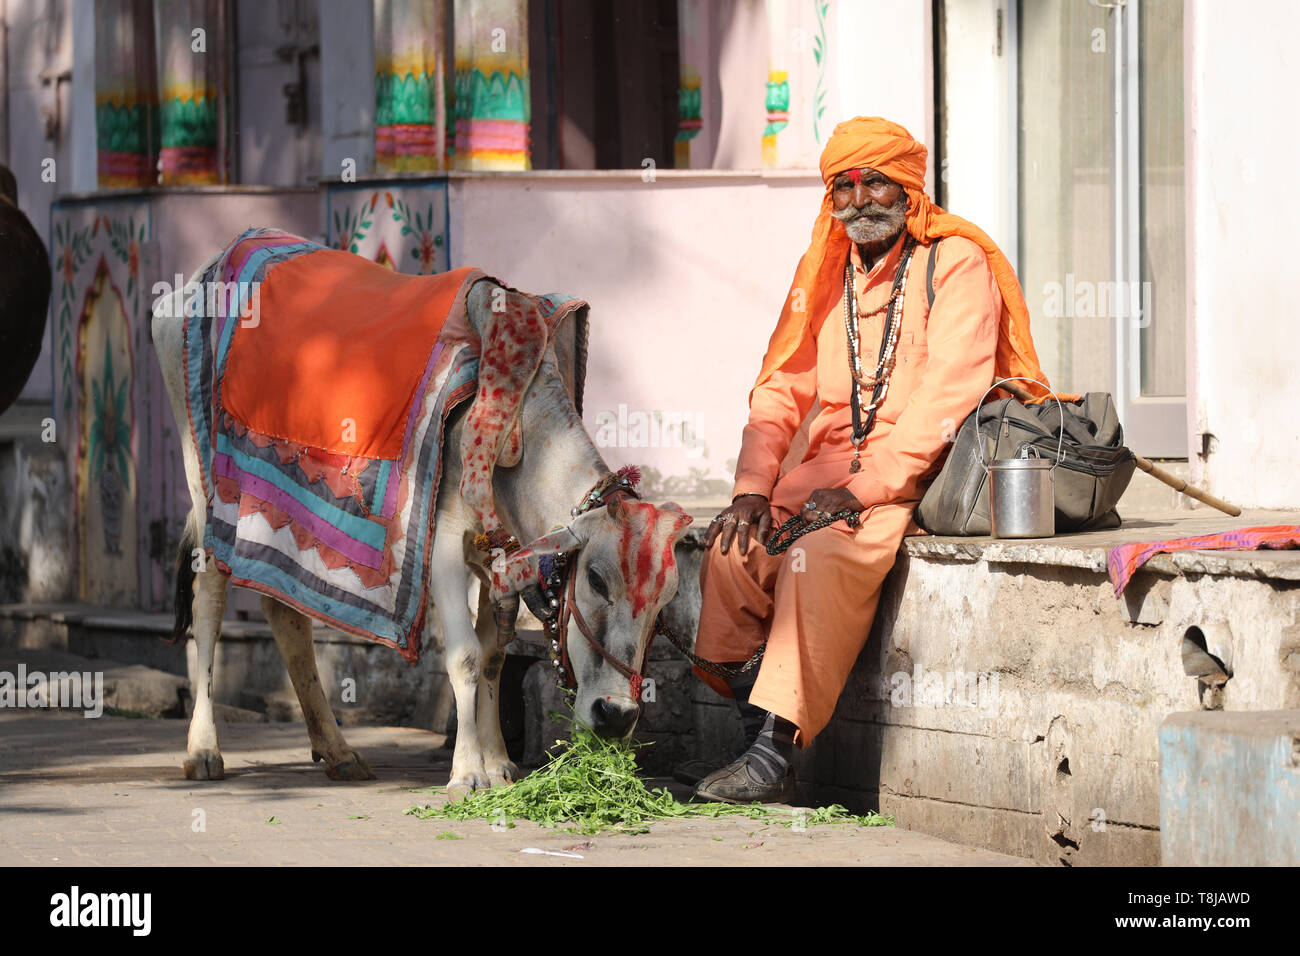 Sadhu with cow sitting on street in Pushkar - Stock Image